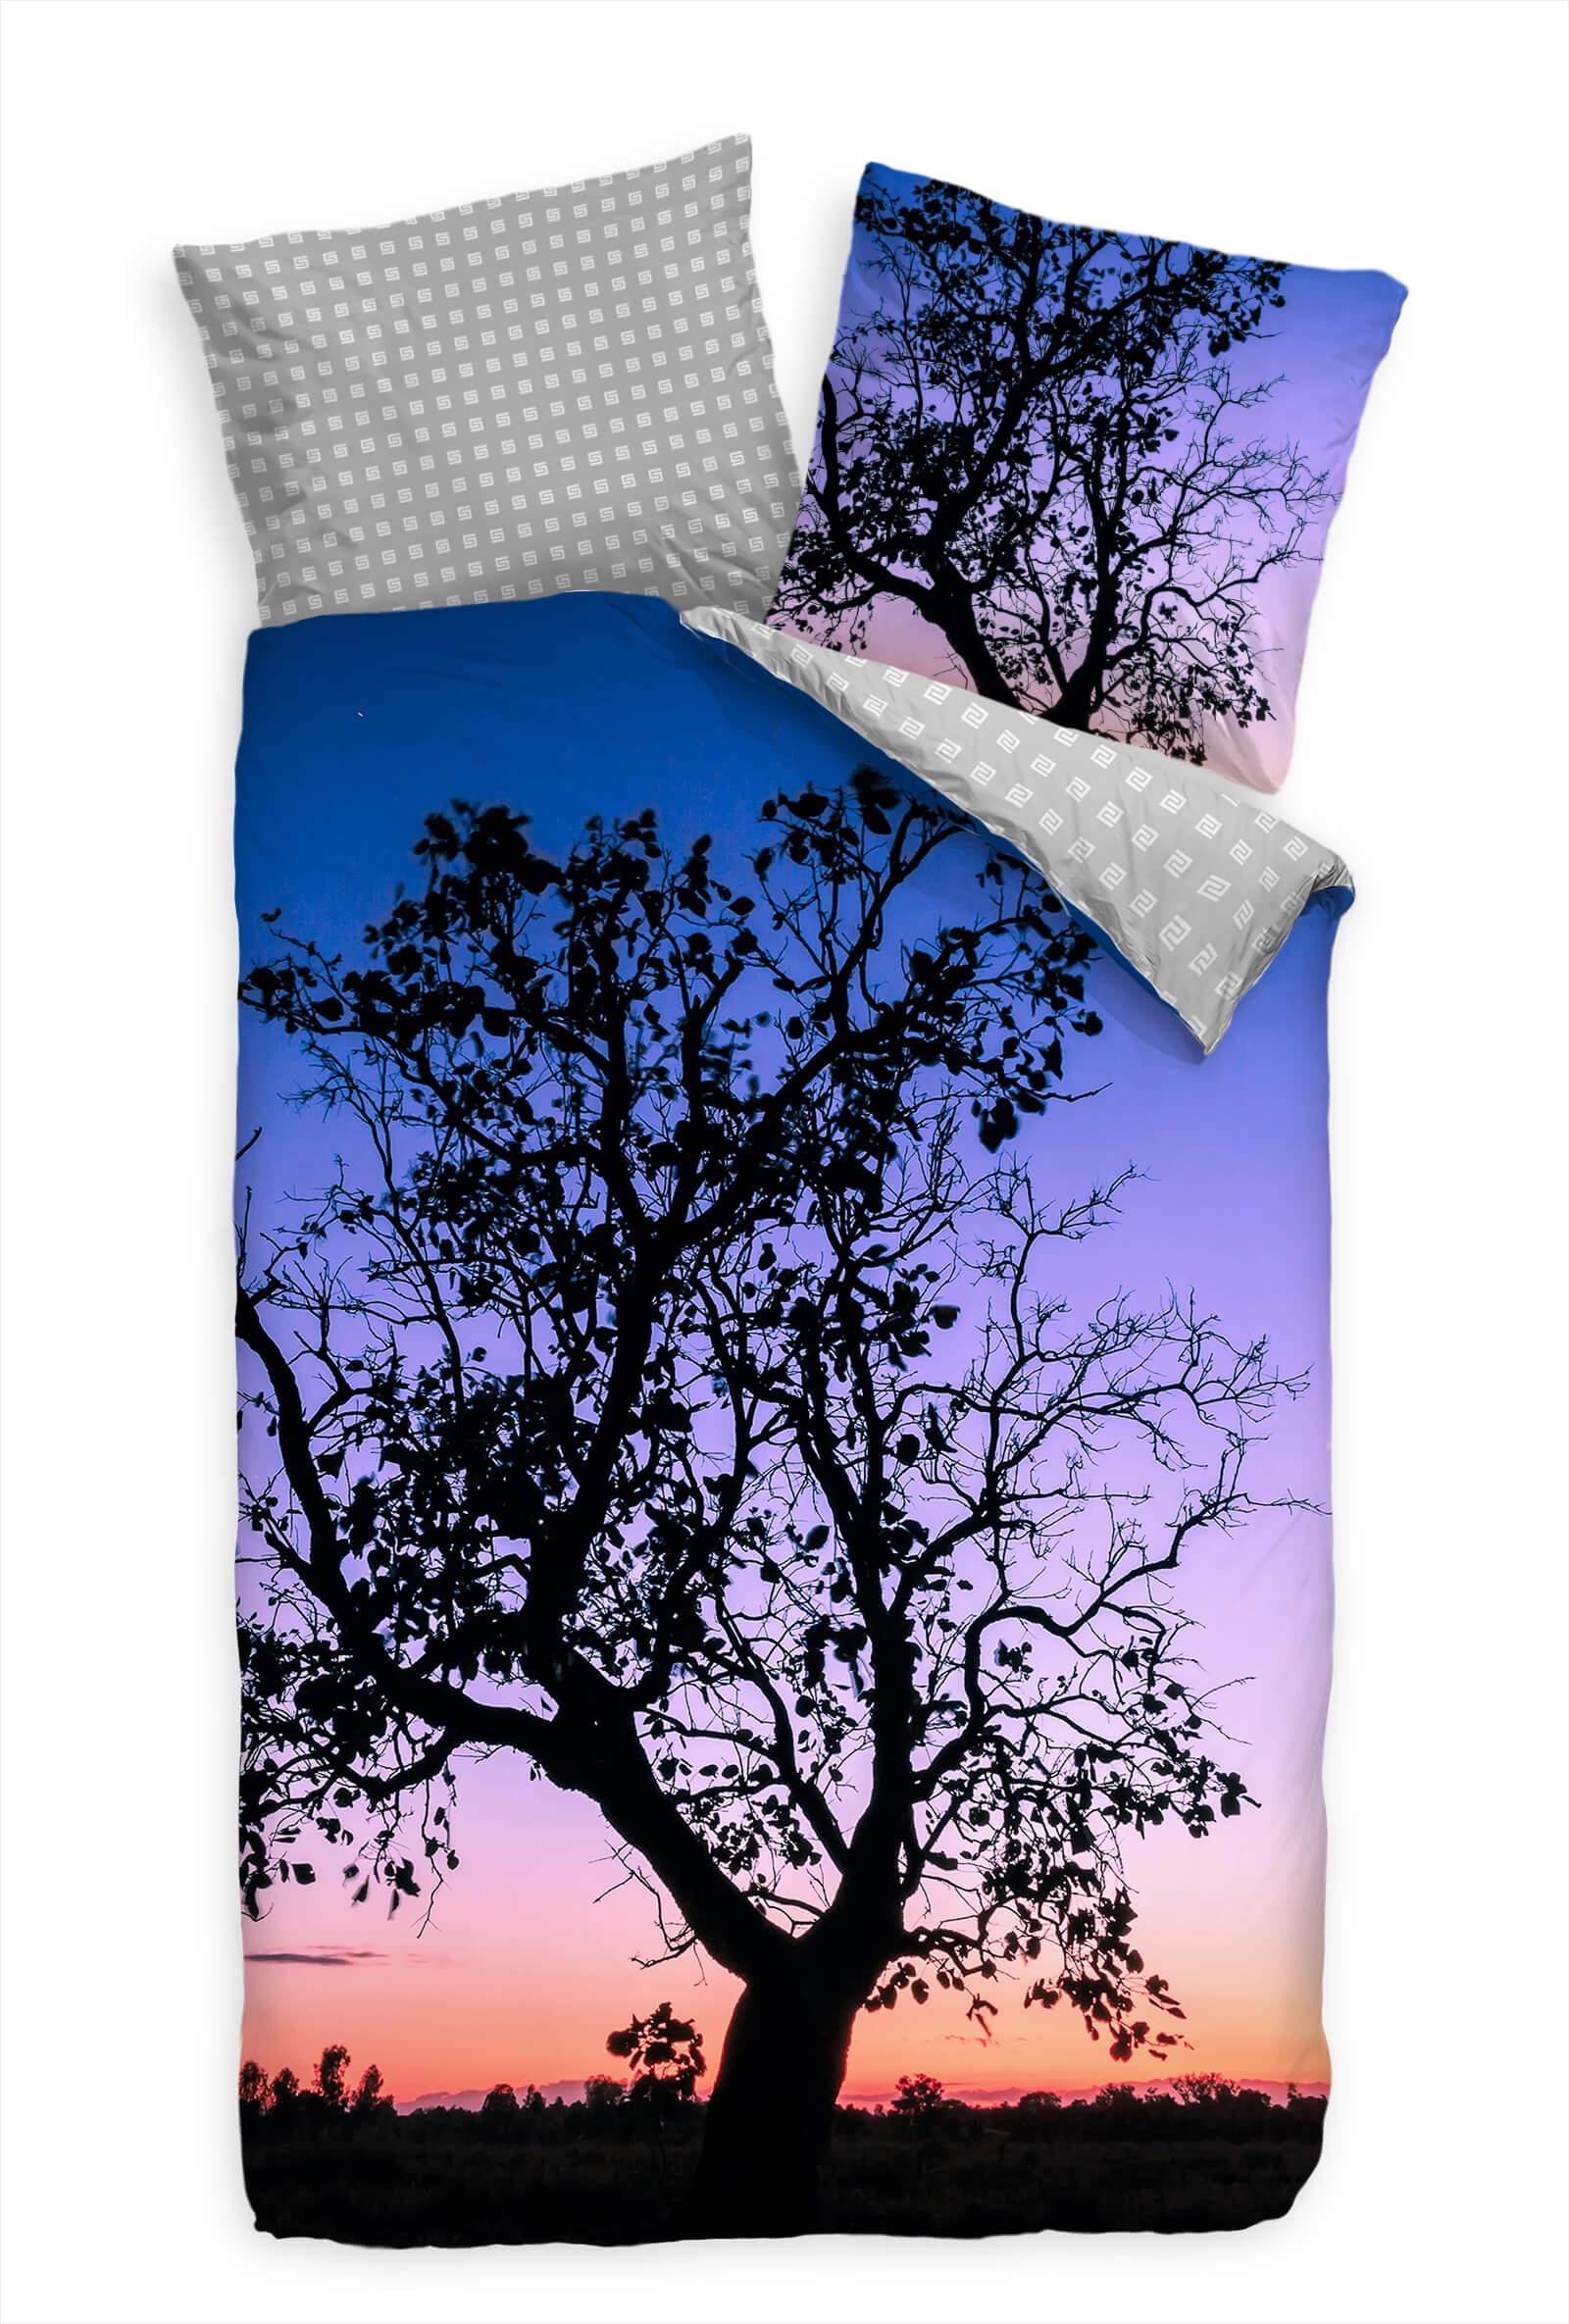 Baum Sonnenuntergang Blau  Bettwäsche Set 135x200 cm  80x80cm  Atmungsaktiv | Charmantes Design